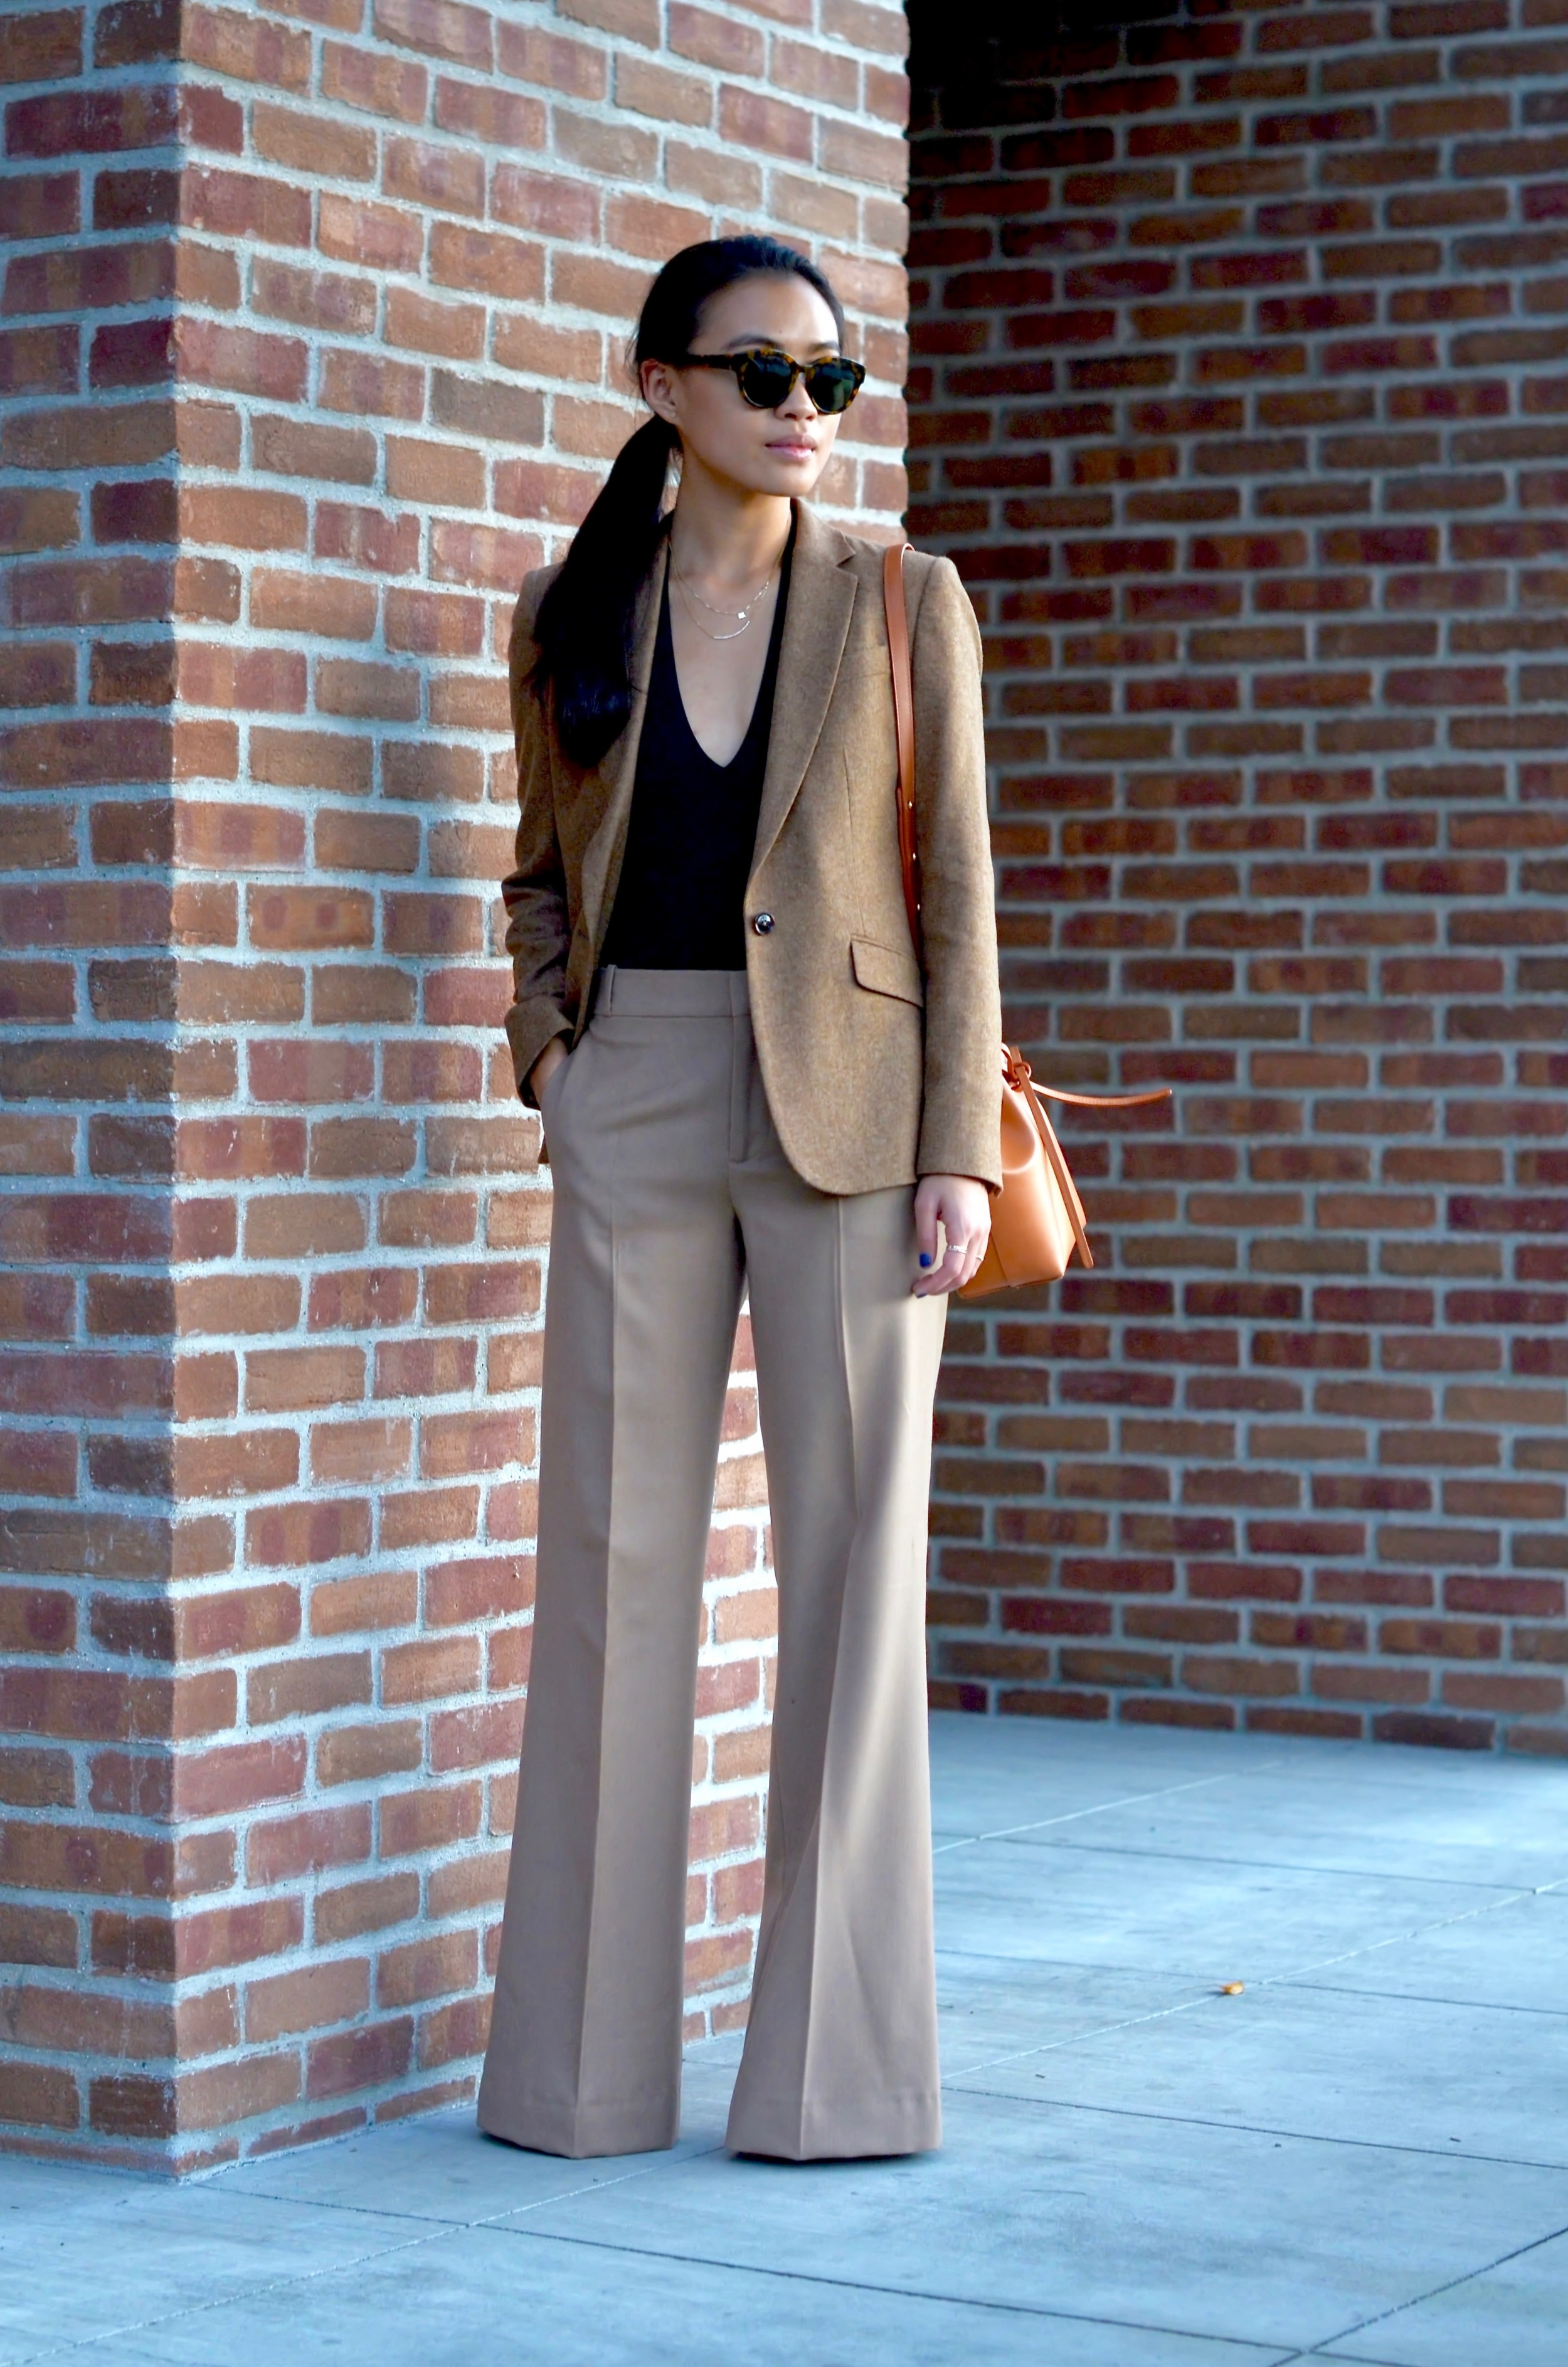 Just Goh With It-Outfit-shopstyle-dressforsuccess-zara-camel-wide-leg-pants-massimo-dutti-blazer-mansur-gavriel-mini-bucket-bag-3.jpg